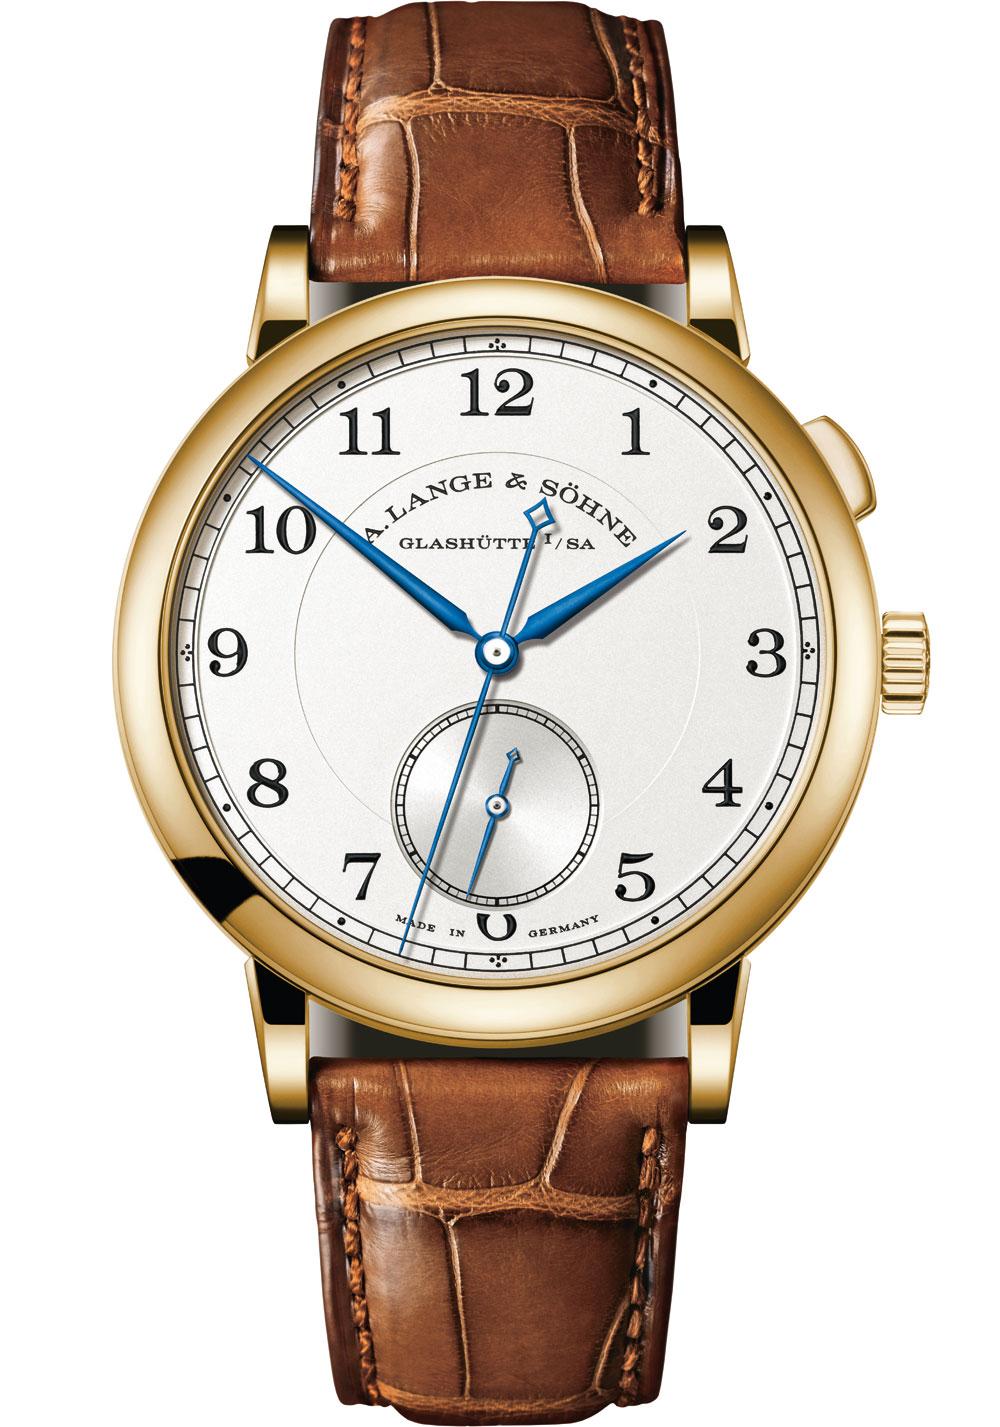 Reloj 1815 Homage to Walter Lange de A. Lange & Söhne oro amarillo